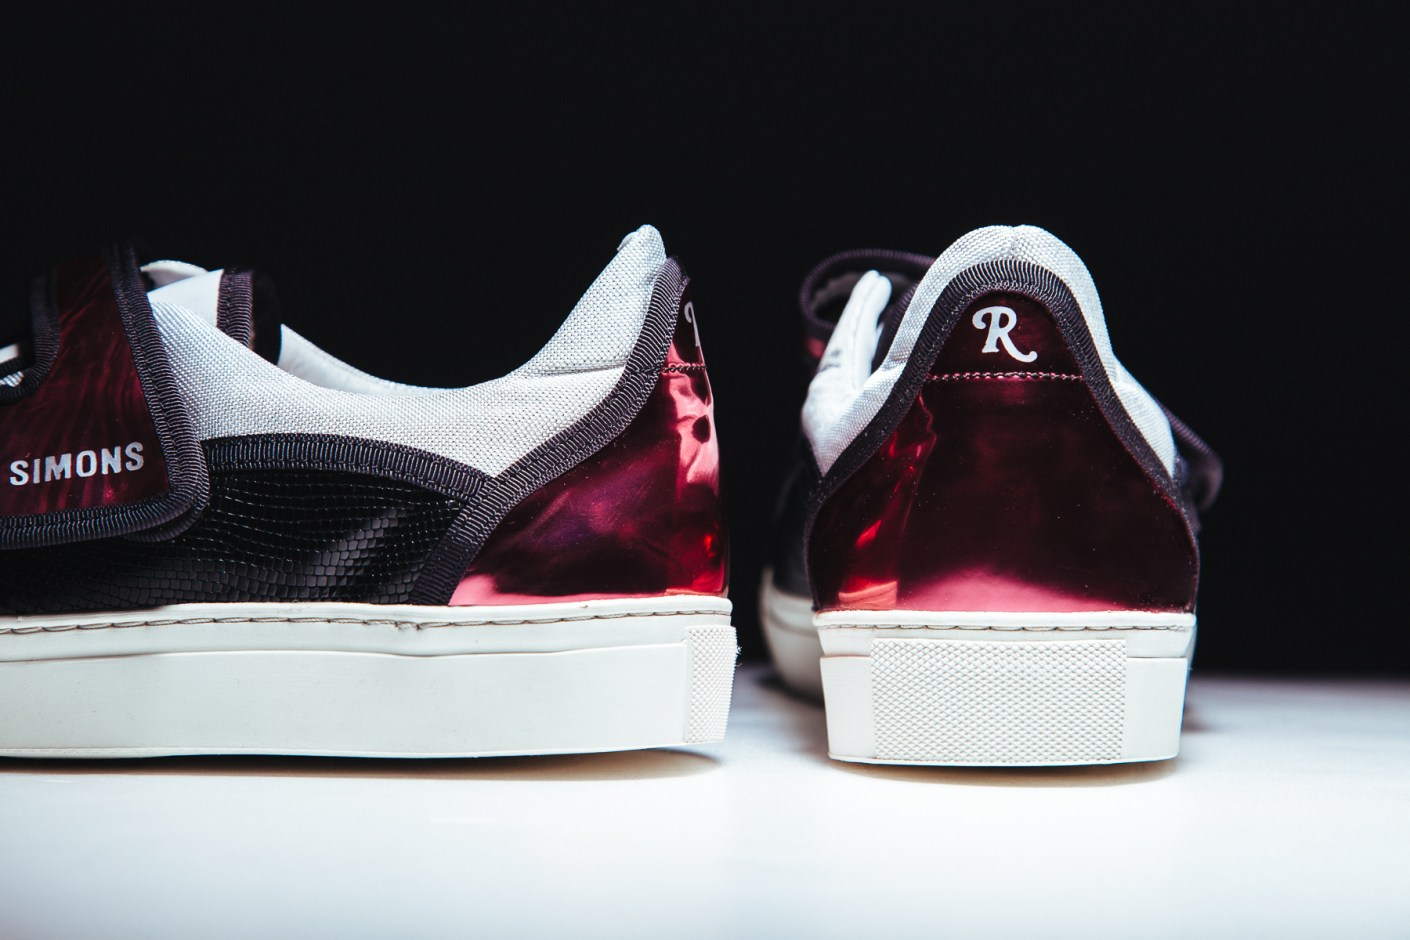 Image of Raf Simons 2014 Spring/Summer Low Velcro Sneaker